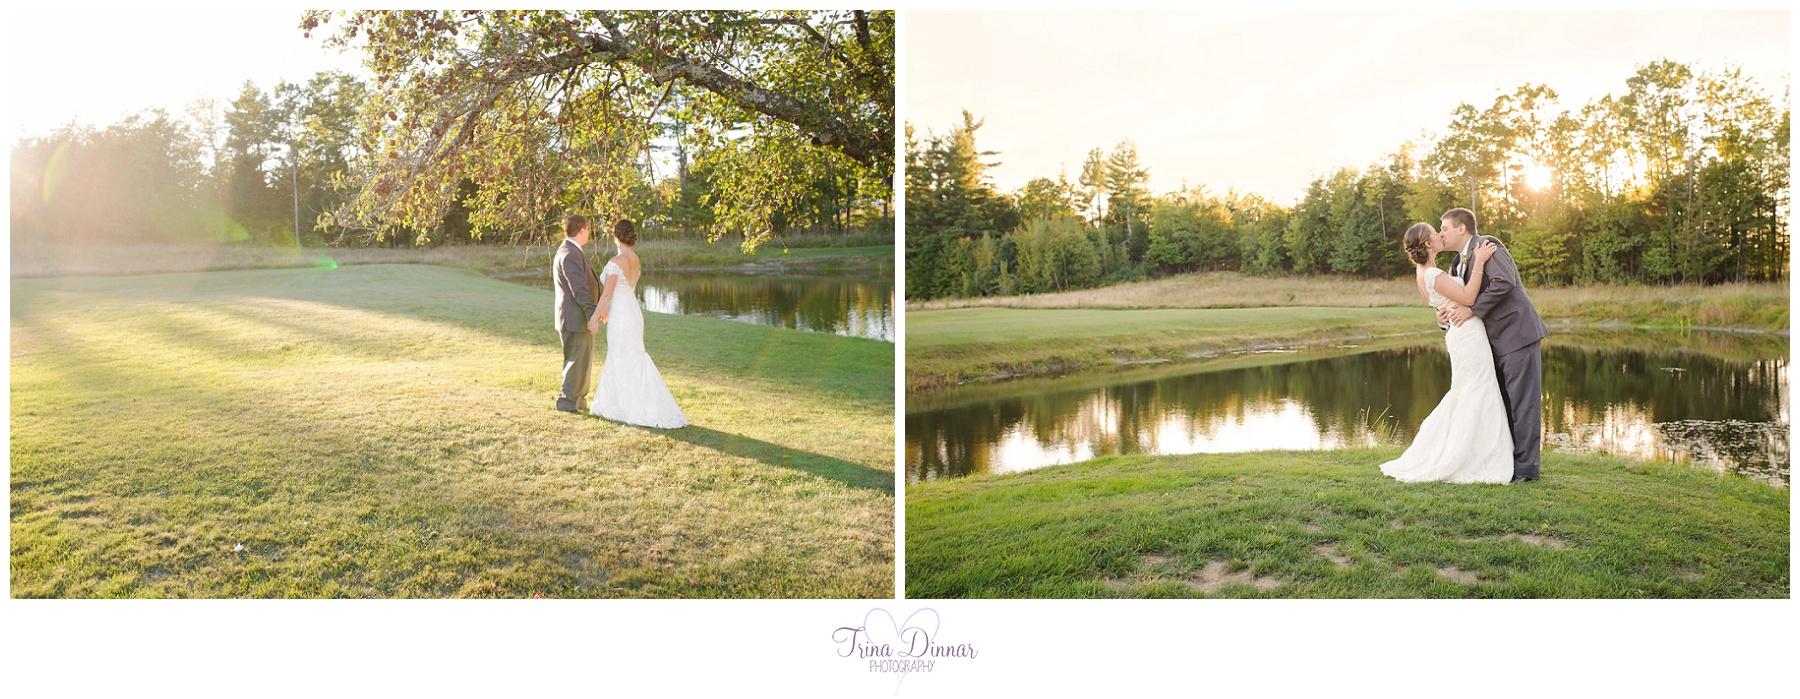 Wedding Photographer at William Allen Farm in Pownal, Maine